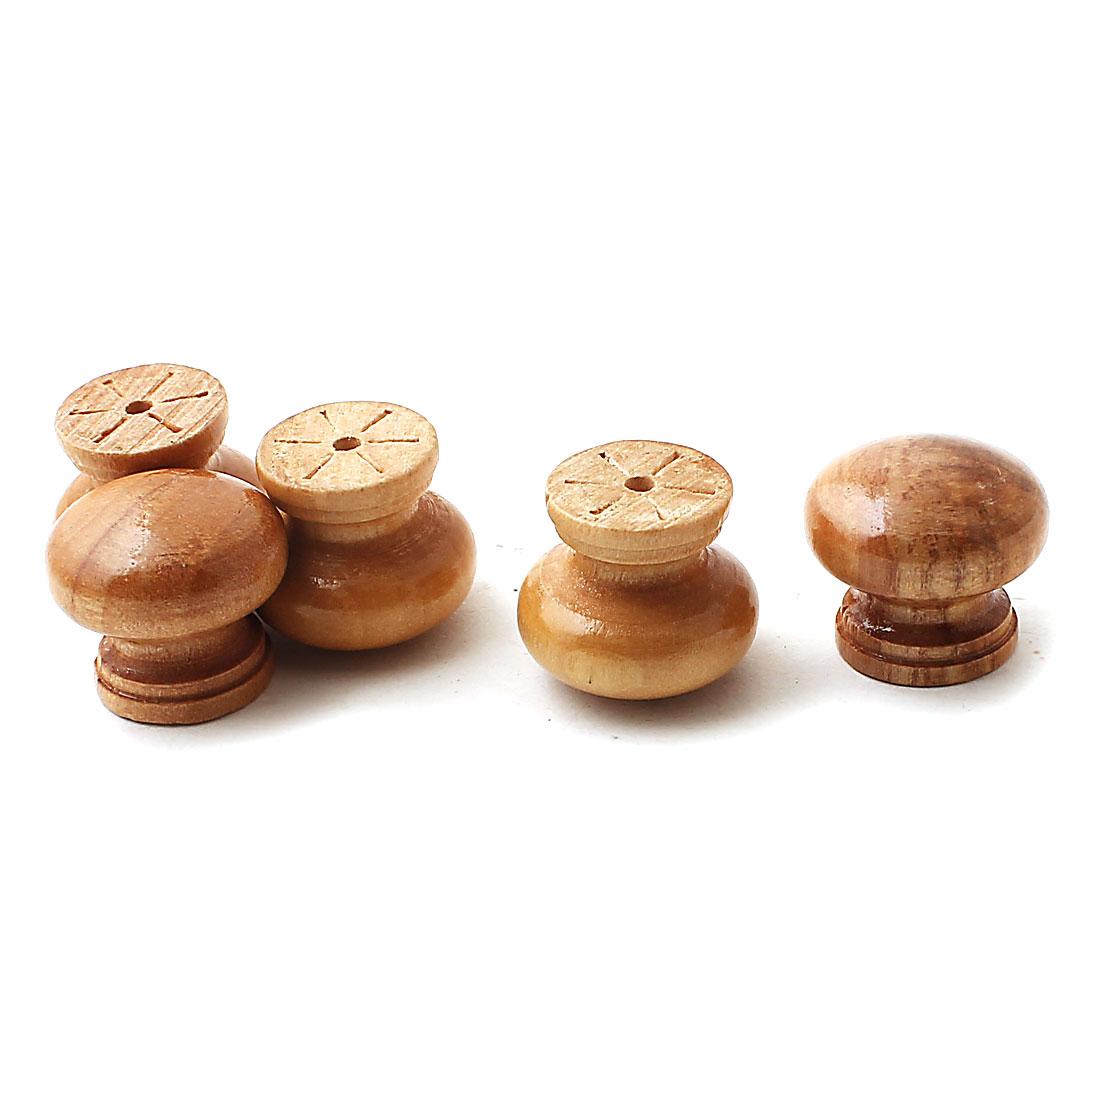 1 Inch Diameter Round Wood Knob Drawer Cabinet Pull Handles Khaki 5PCS